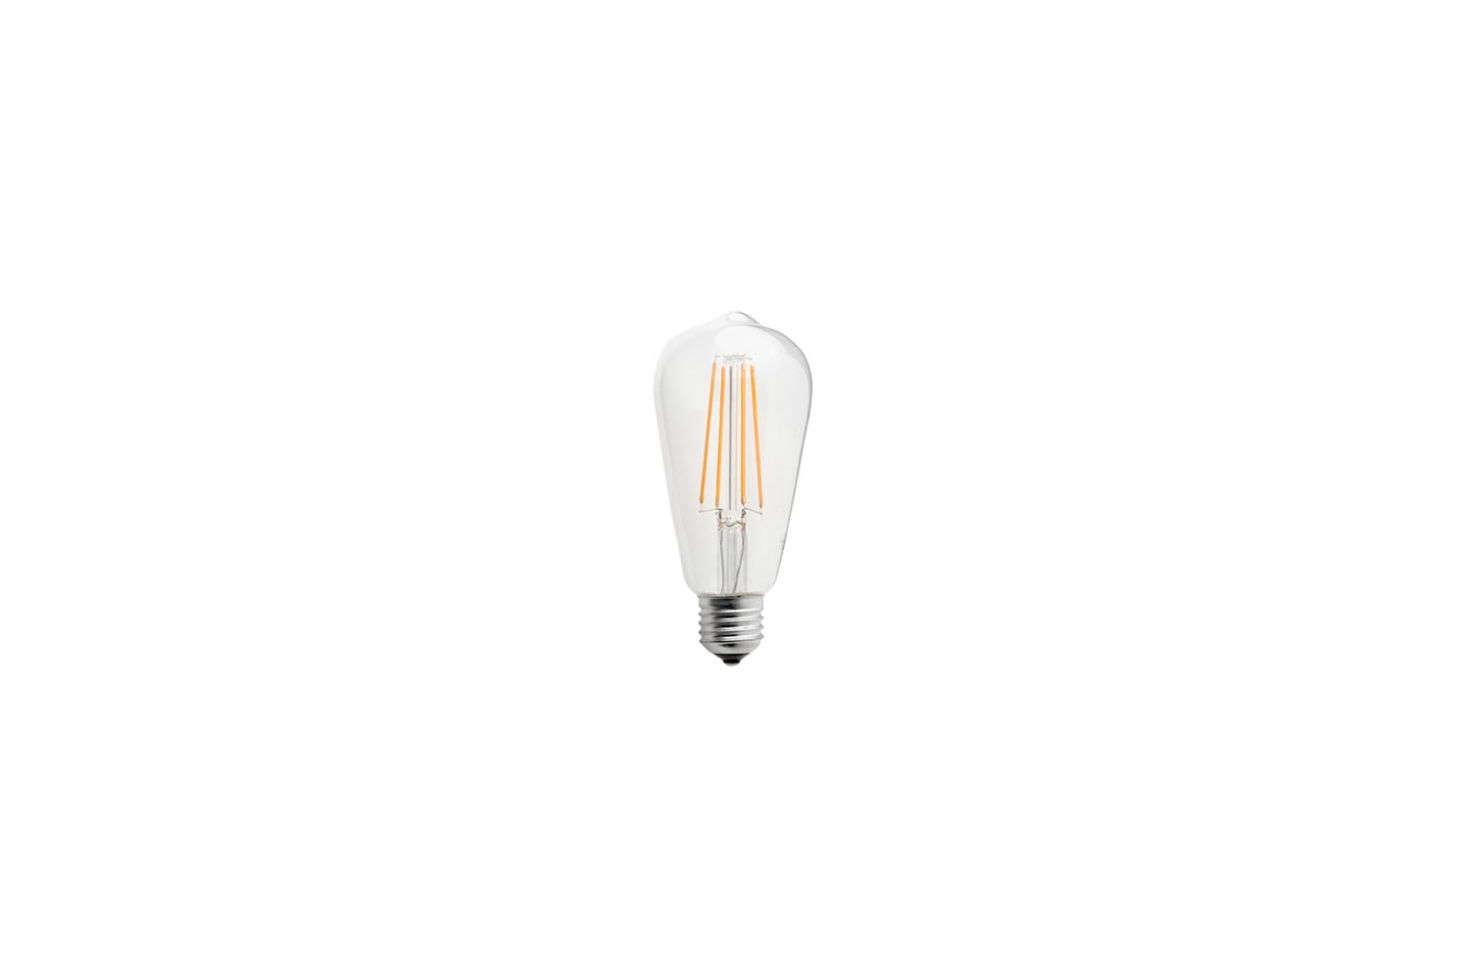 The Zangra LED Light Bulb Filament Edison 4W casts an extra warm light; €.95 at Zangra.